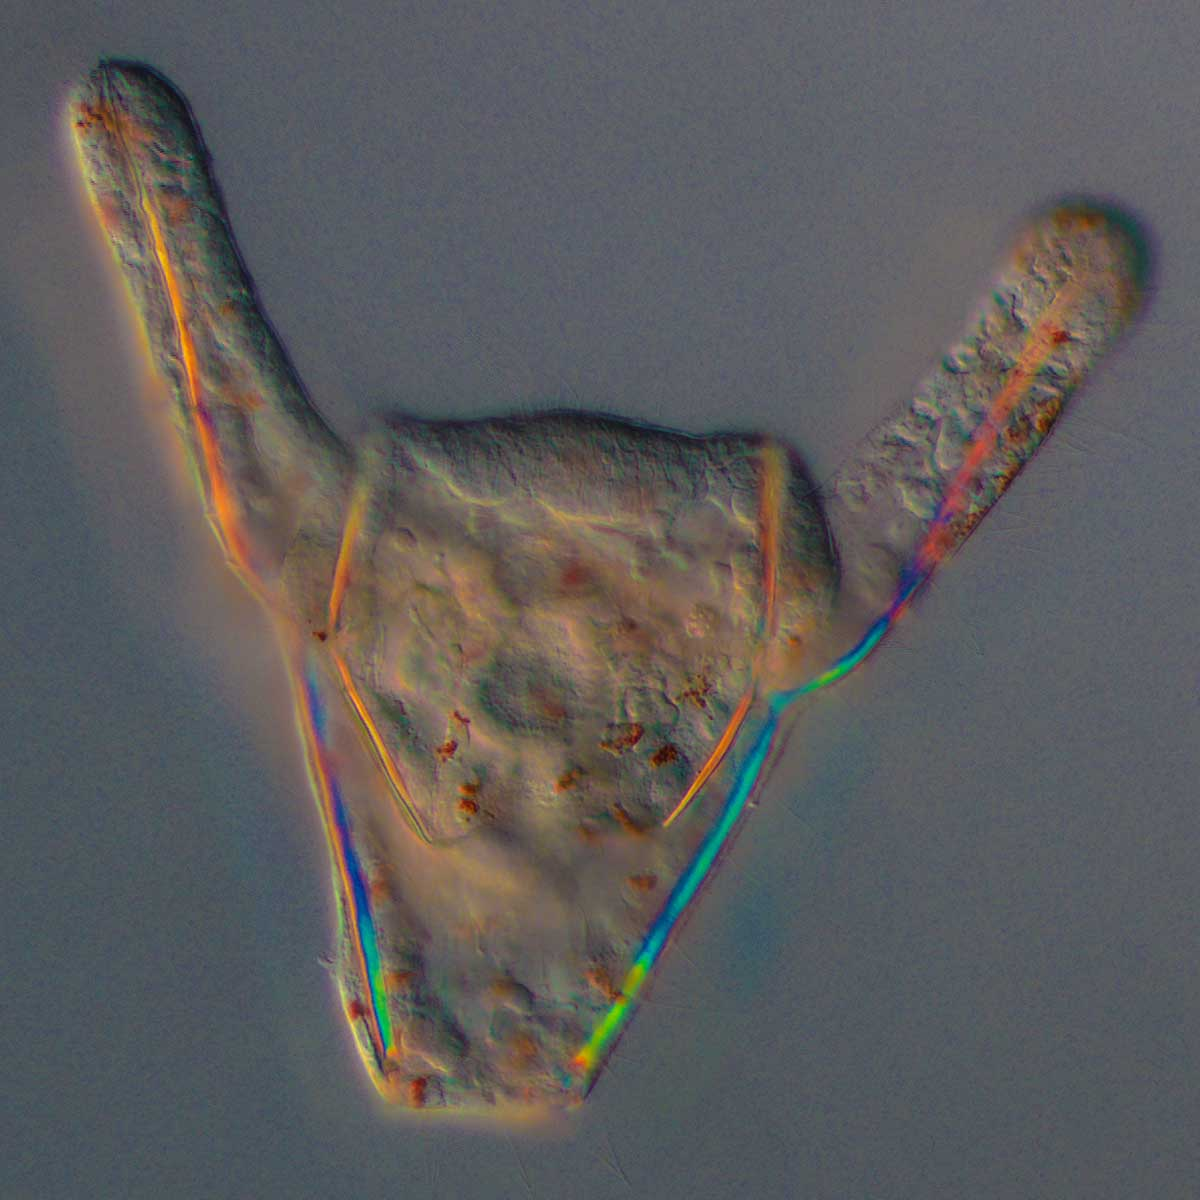 Pluteus larva of of the sea urchin  Lytechinus variegatus